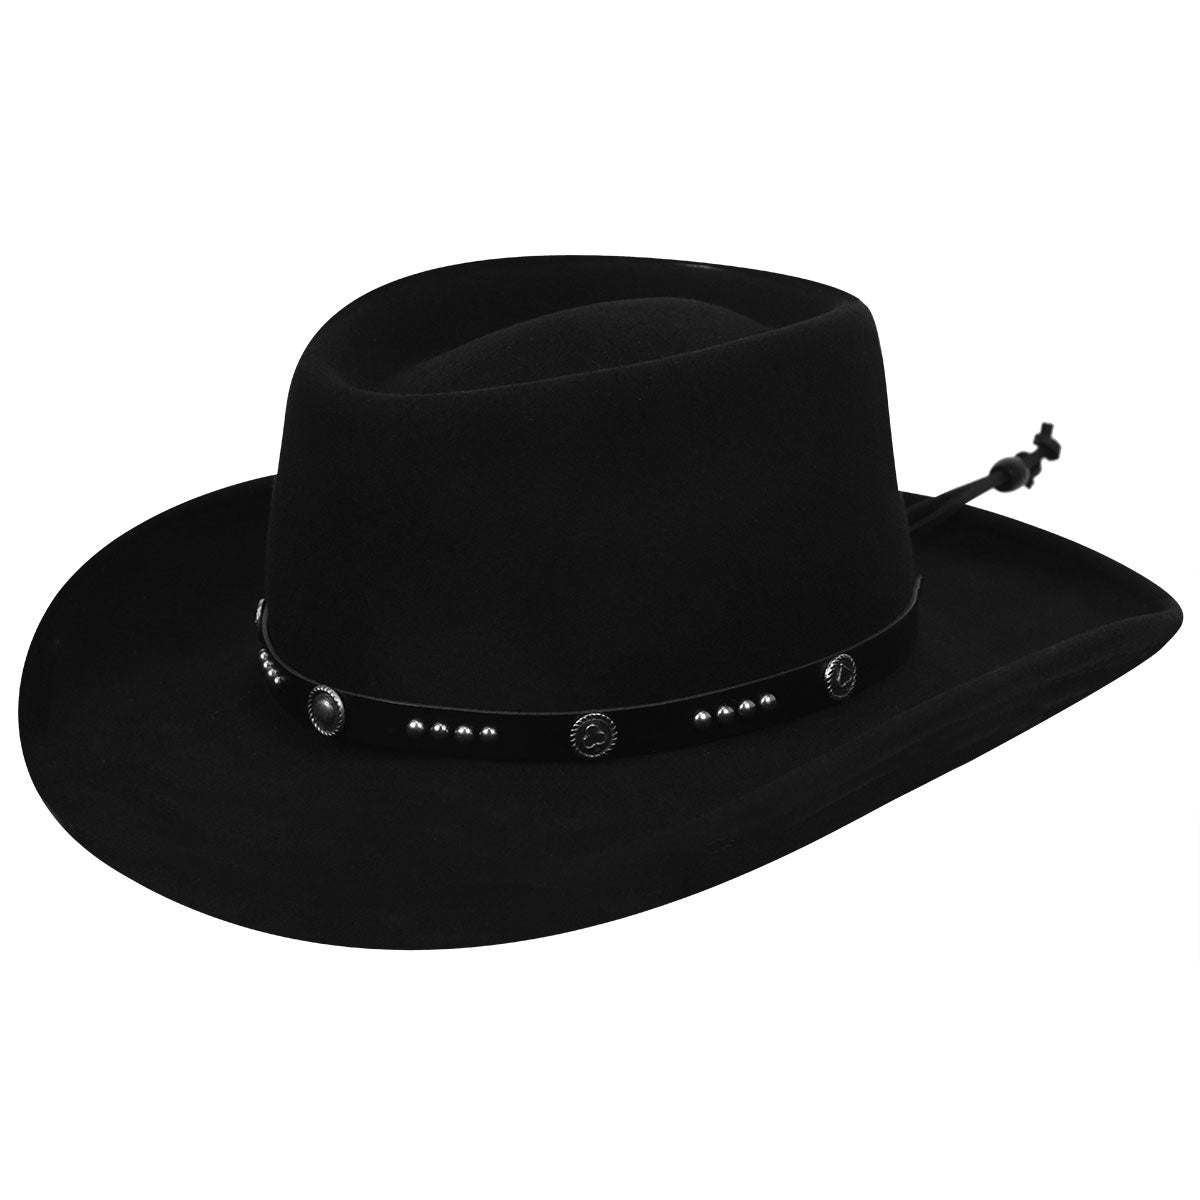 Renegade Renegade by Bailey Joker Western Hat in Black